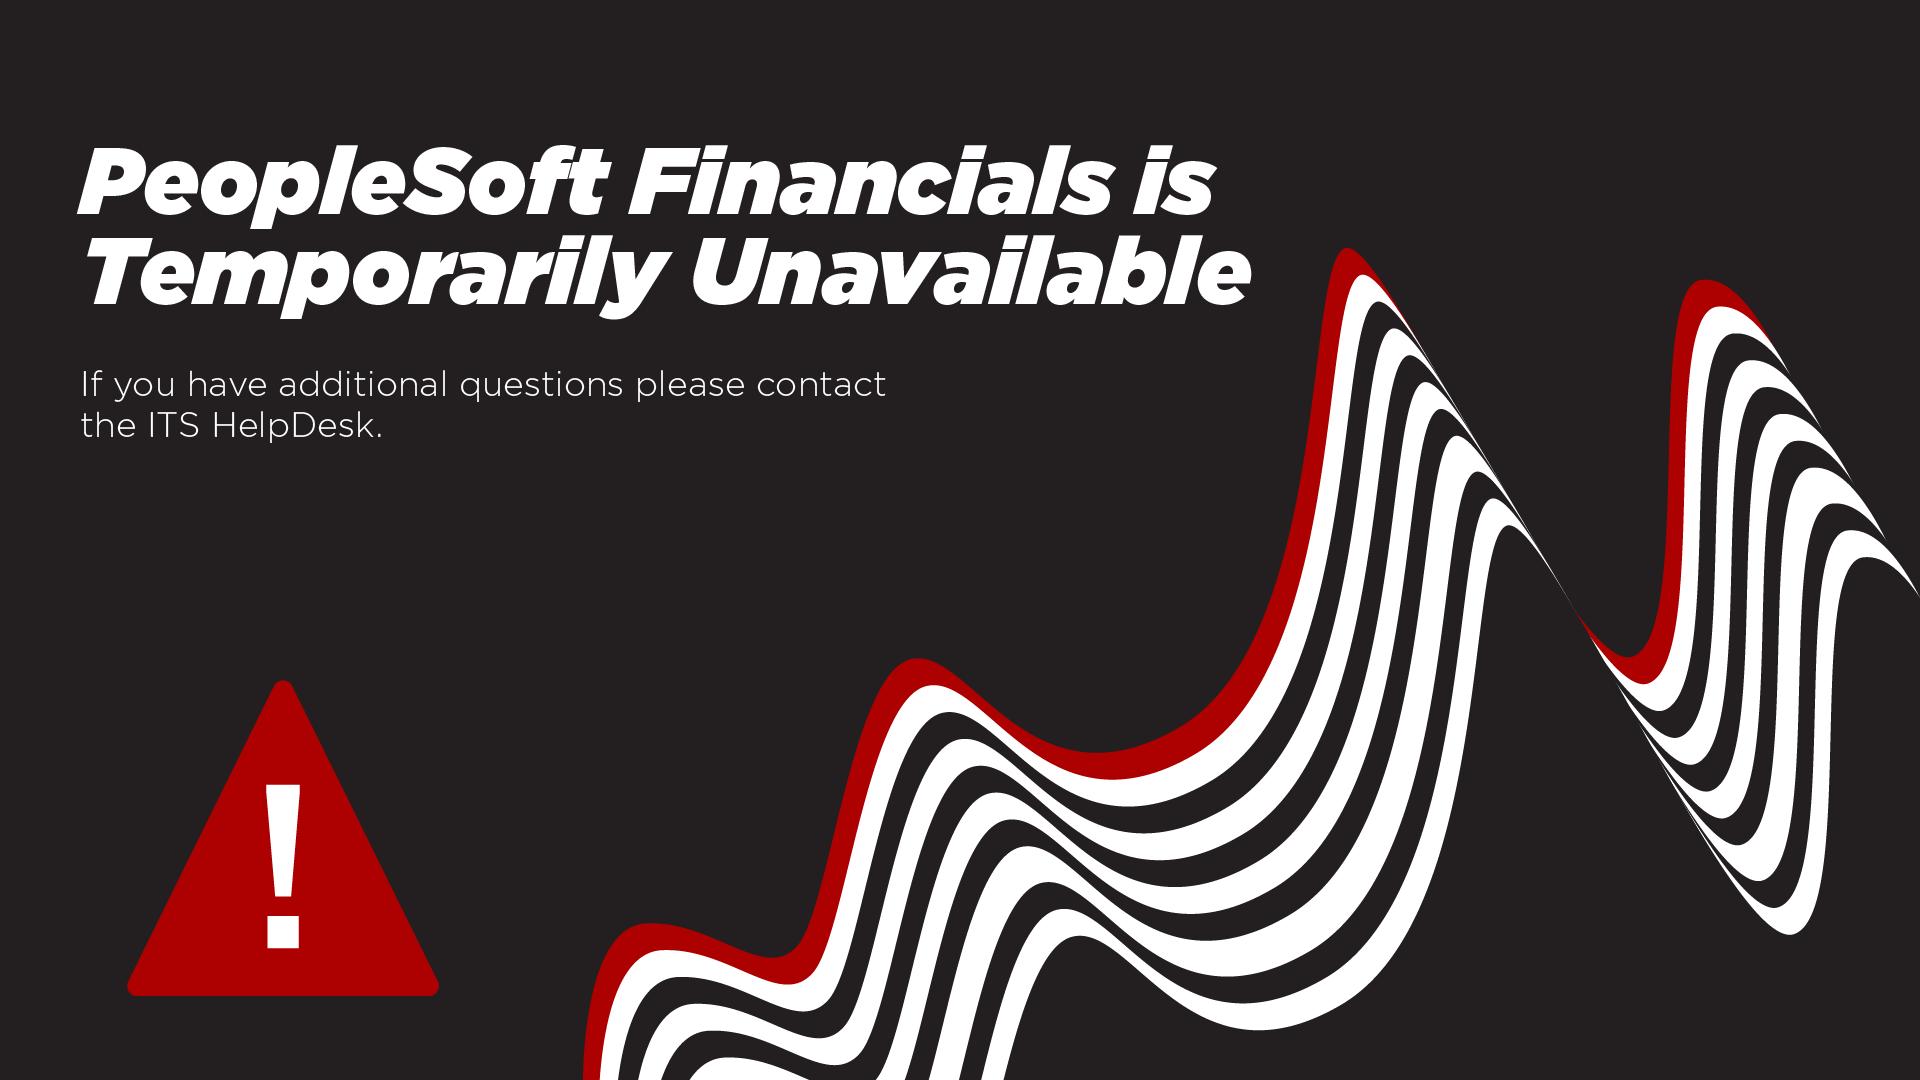 Financials is Temporarily Unavailable